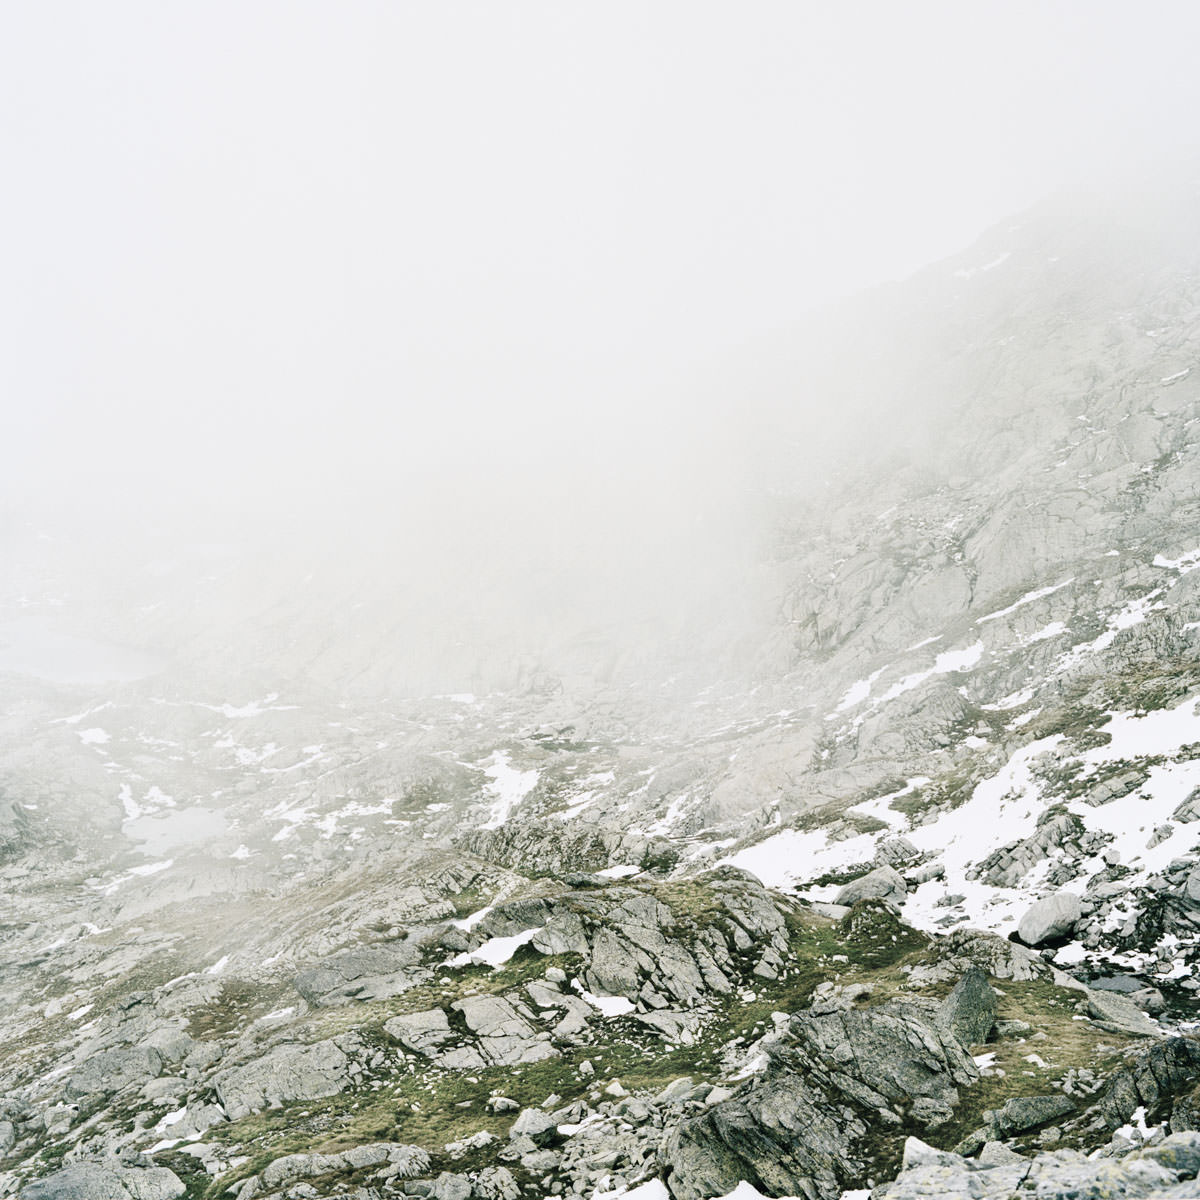 splügen pass schlechte sicht geröll schnee berge nebel wandern gipfel horizont landschaft italien jörn strojny